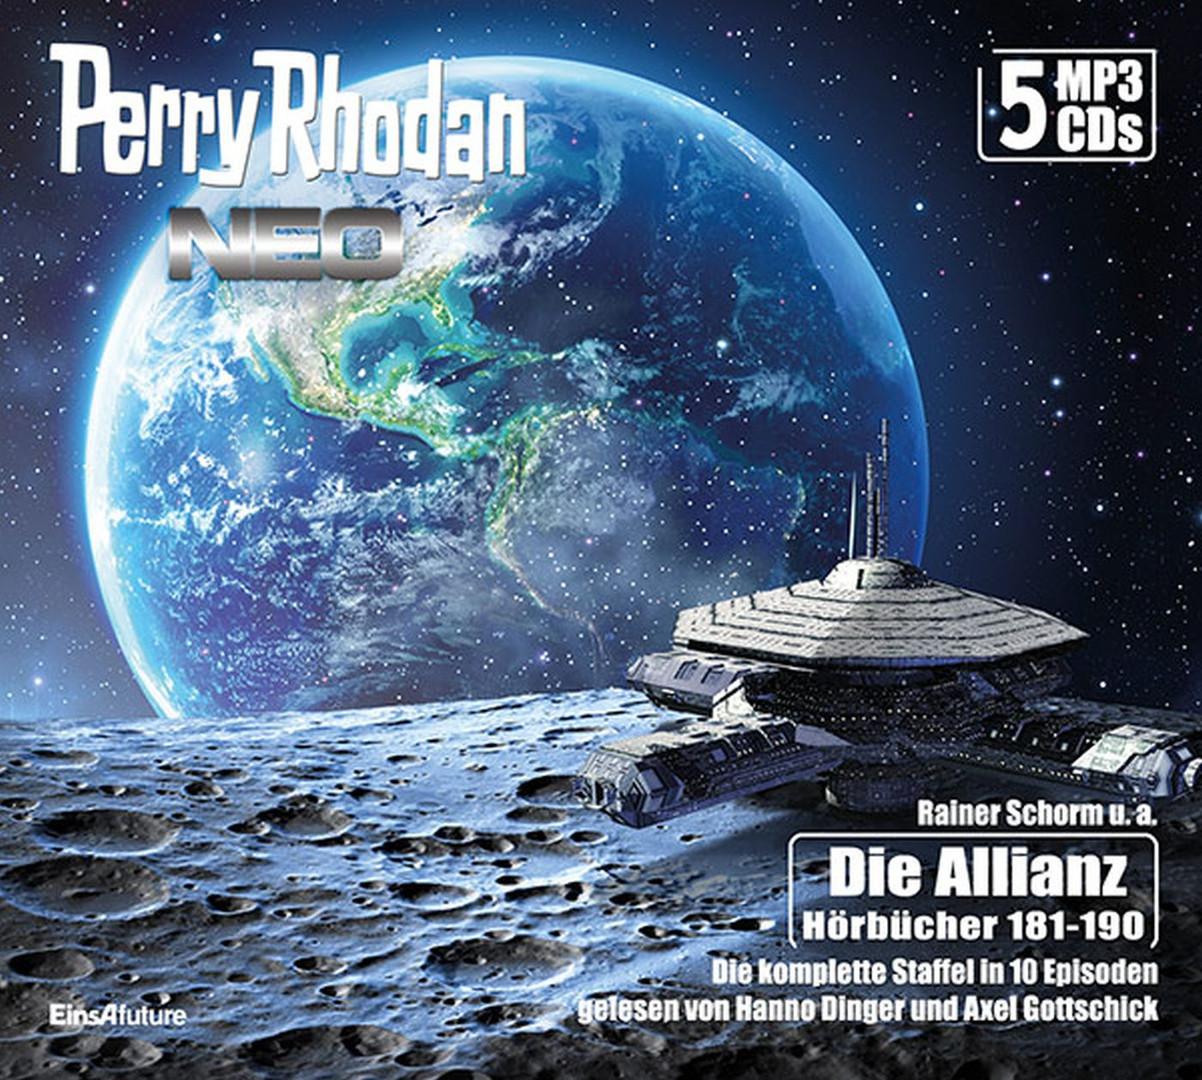 Perry Rhodan Neo MP3-CD Episoden 181-190 (5 CD-Box)